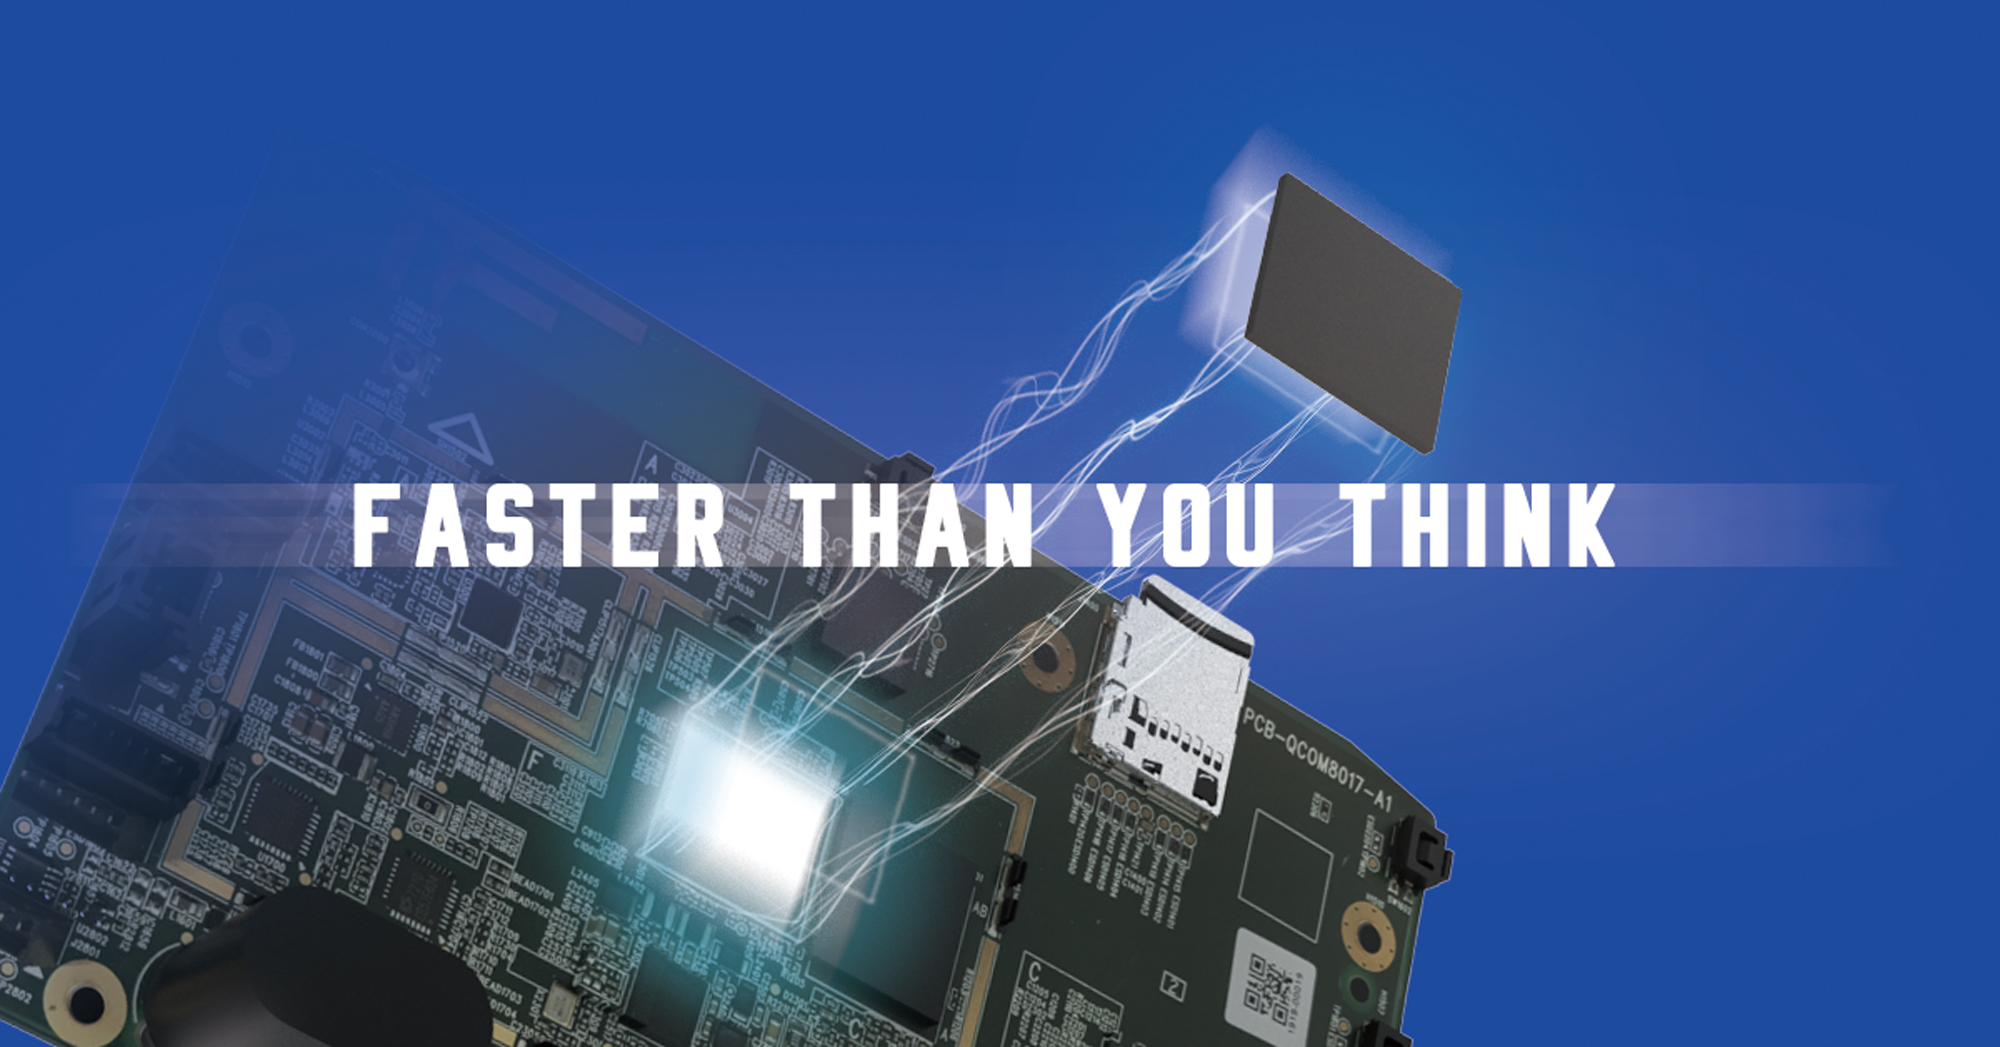 Kebbi Air S 效能|Kebbi Air S 所搭載的八核心 1.8 GHz 處理器,在整體性能、圖像處理速度、體驗順暢度等全方面占據優勢!